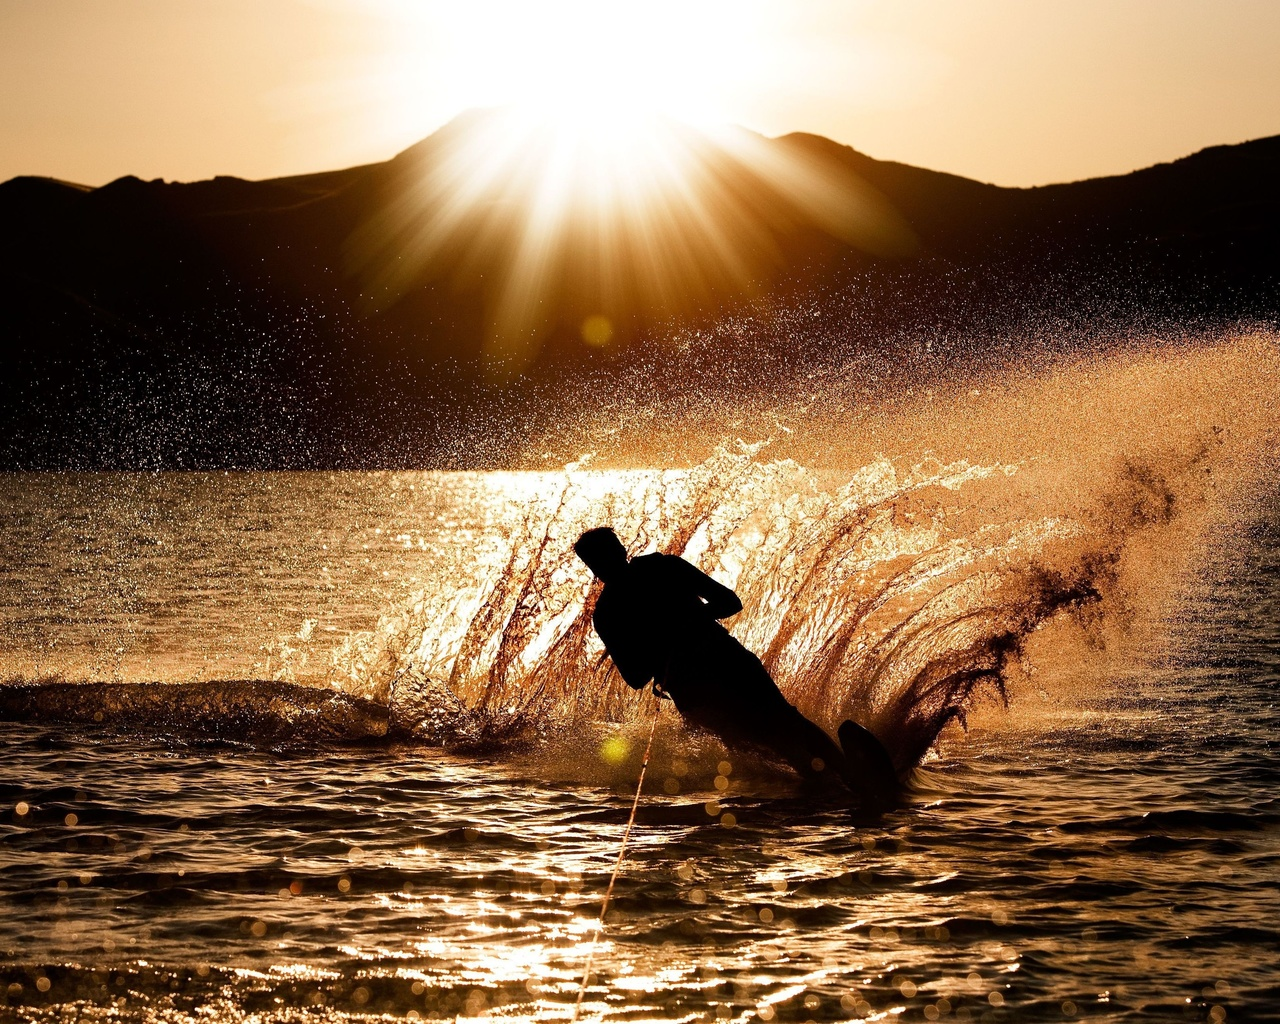 спорт, мужчина, парень, силуэт, брызги, вода, волны, море, океан, солнце, закат, фон